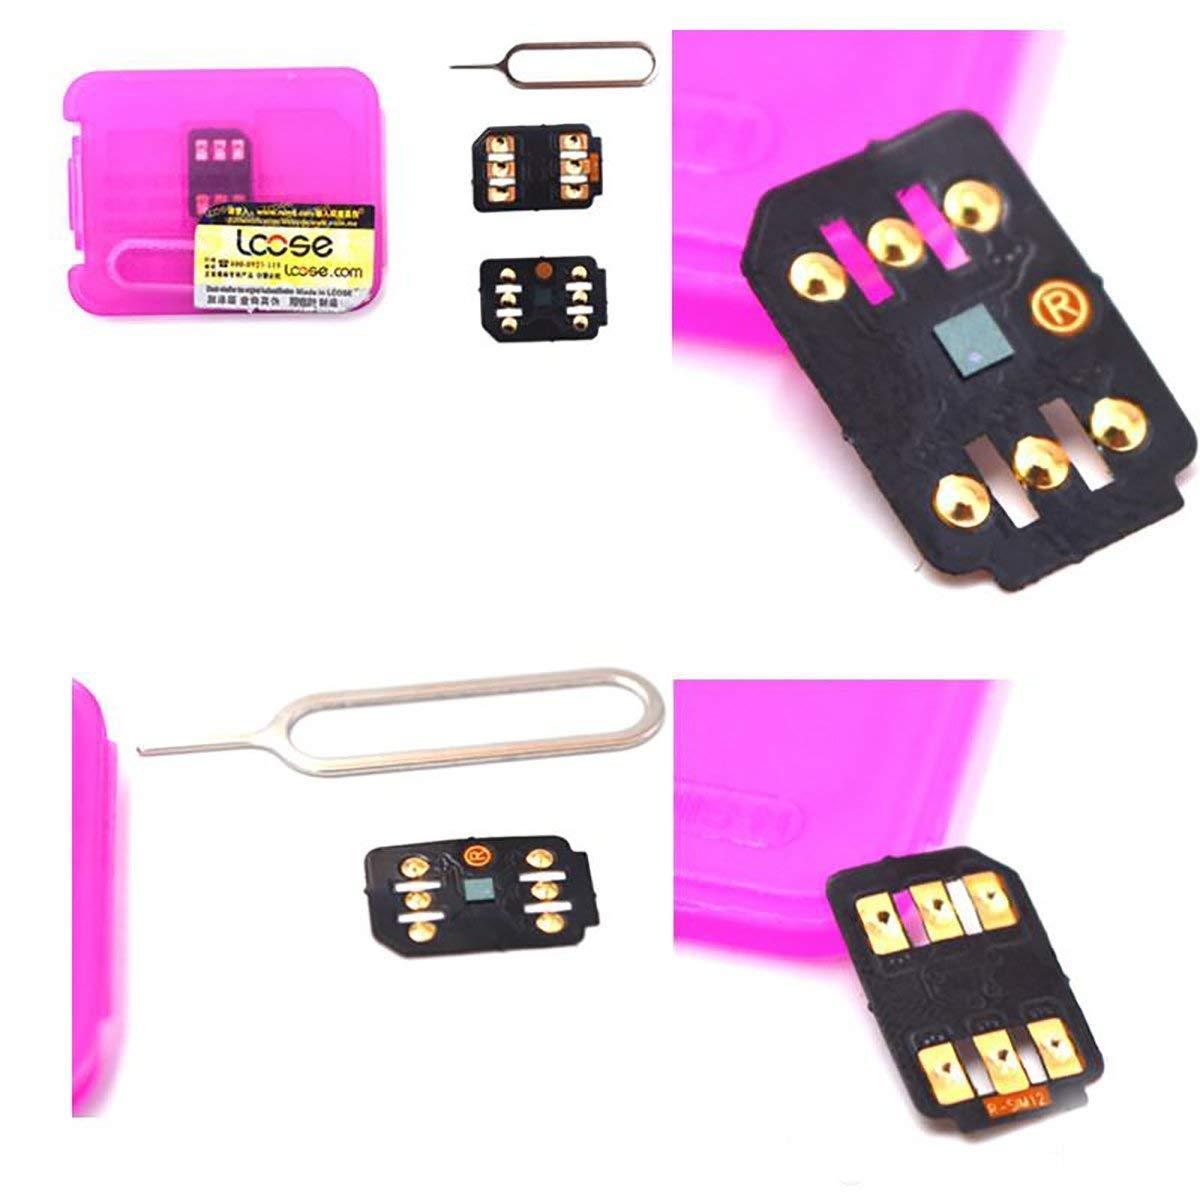 Ghostek R-Sim 12 for iPhone 5-5s-6/6S-7-7plus-8-8plus-x (Black)